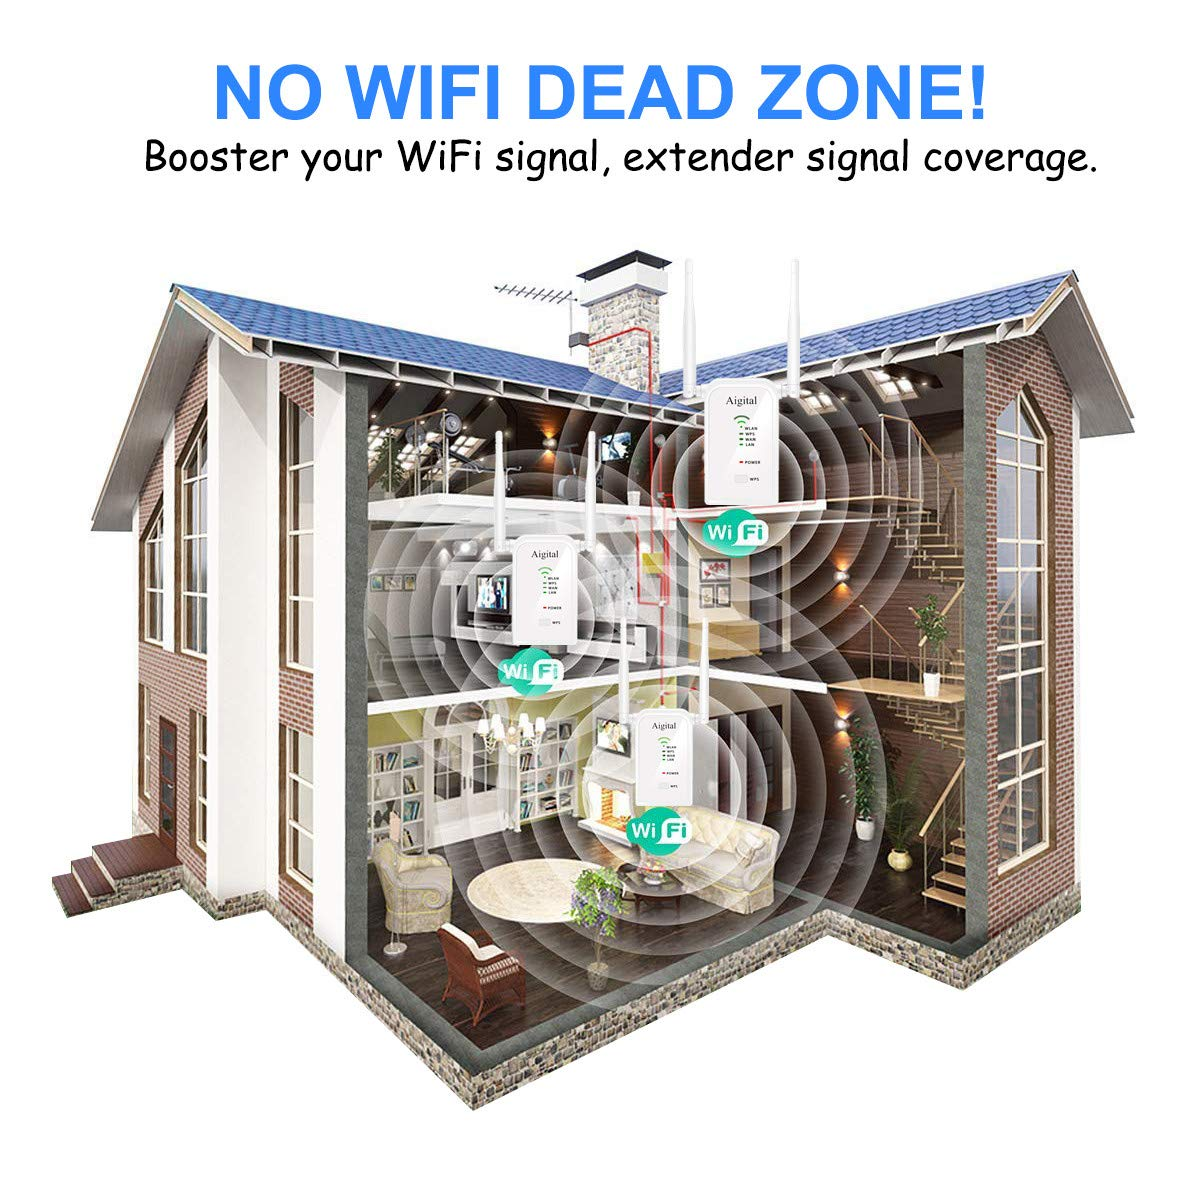 Multifunktion WiFi Range Extender 2.4GHz Aigital WLAN Repeater Router Signal WLAN Verstaerker 300Mbits, LAN Port, WPS, AP//Router//Repeater Modus Kompatibel mit Allen WLAN Ger/äten